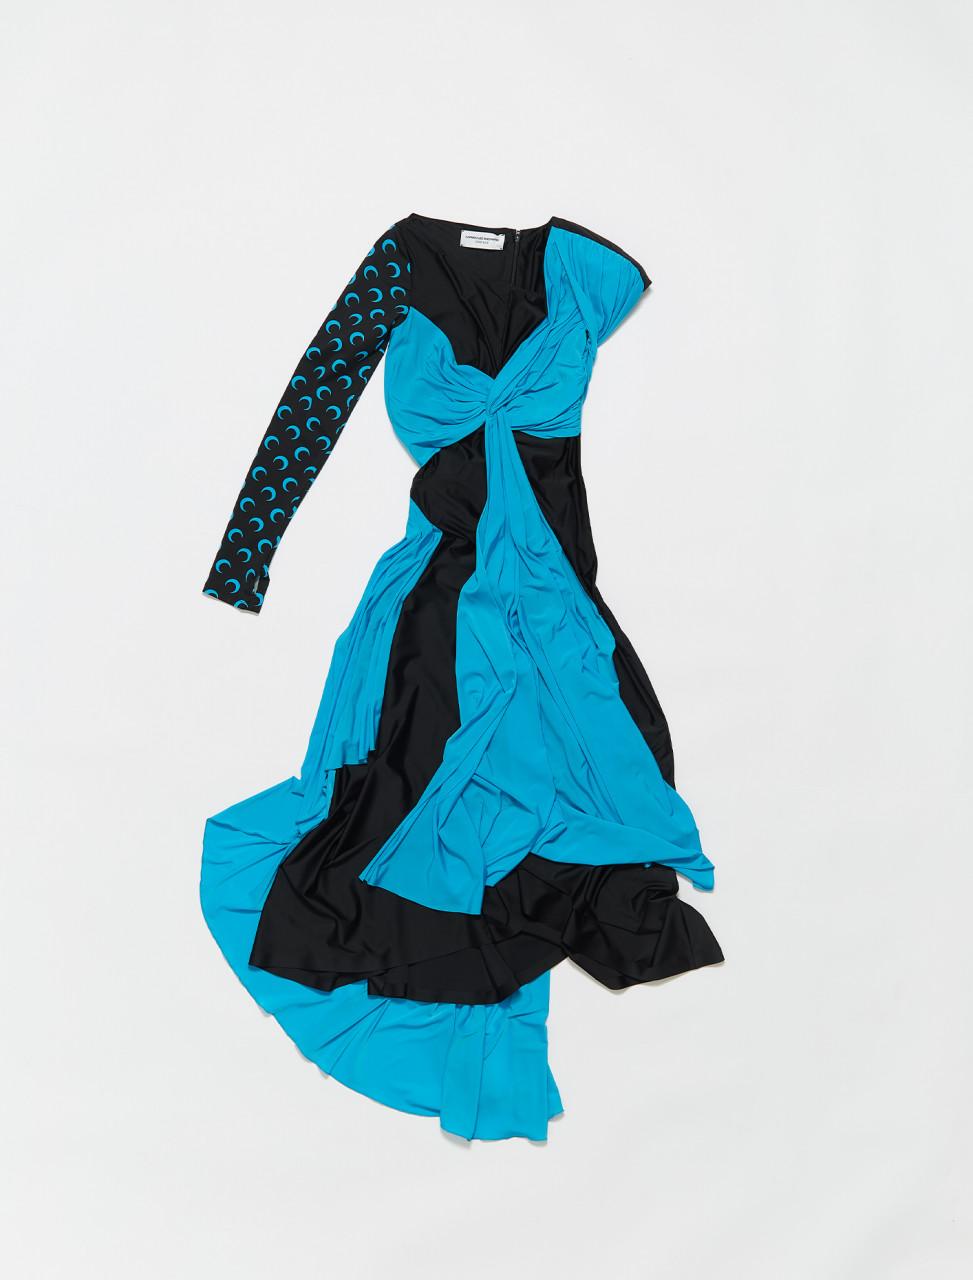 277-D009SS20WBLACK MARINE SERRE DRAPE JERSEY DRESS BLACK BLUE